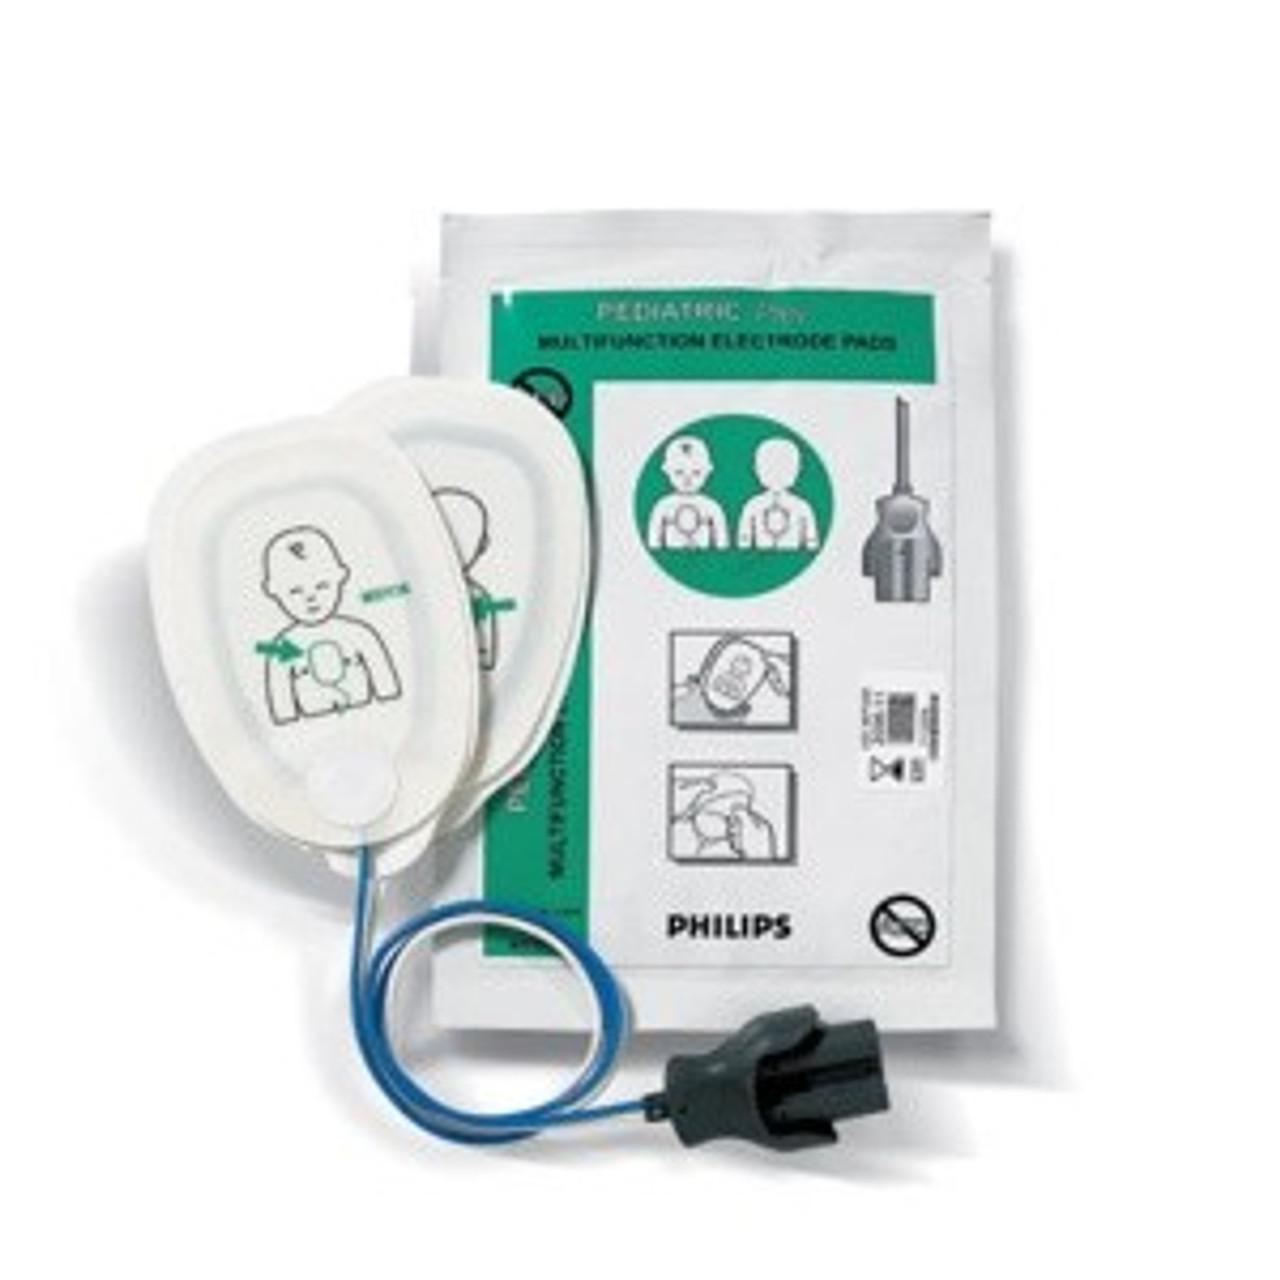 Philips Pediatric Defibrillation Pads M3717A